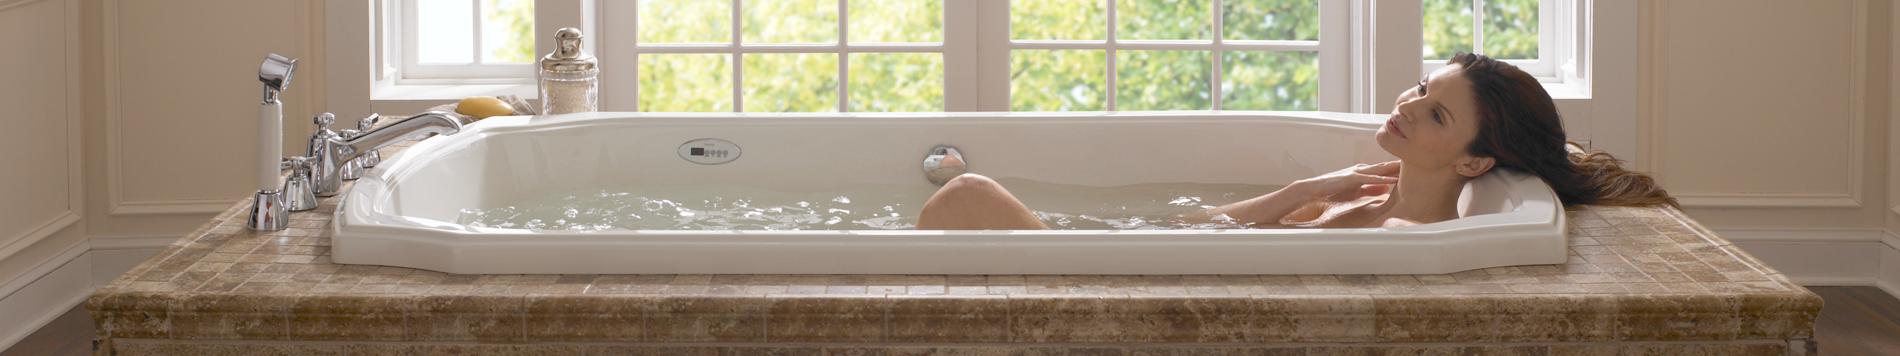 Baths - TotoUSA.com